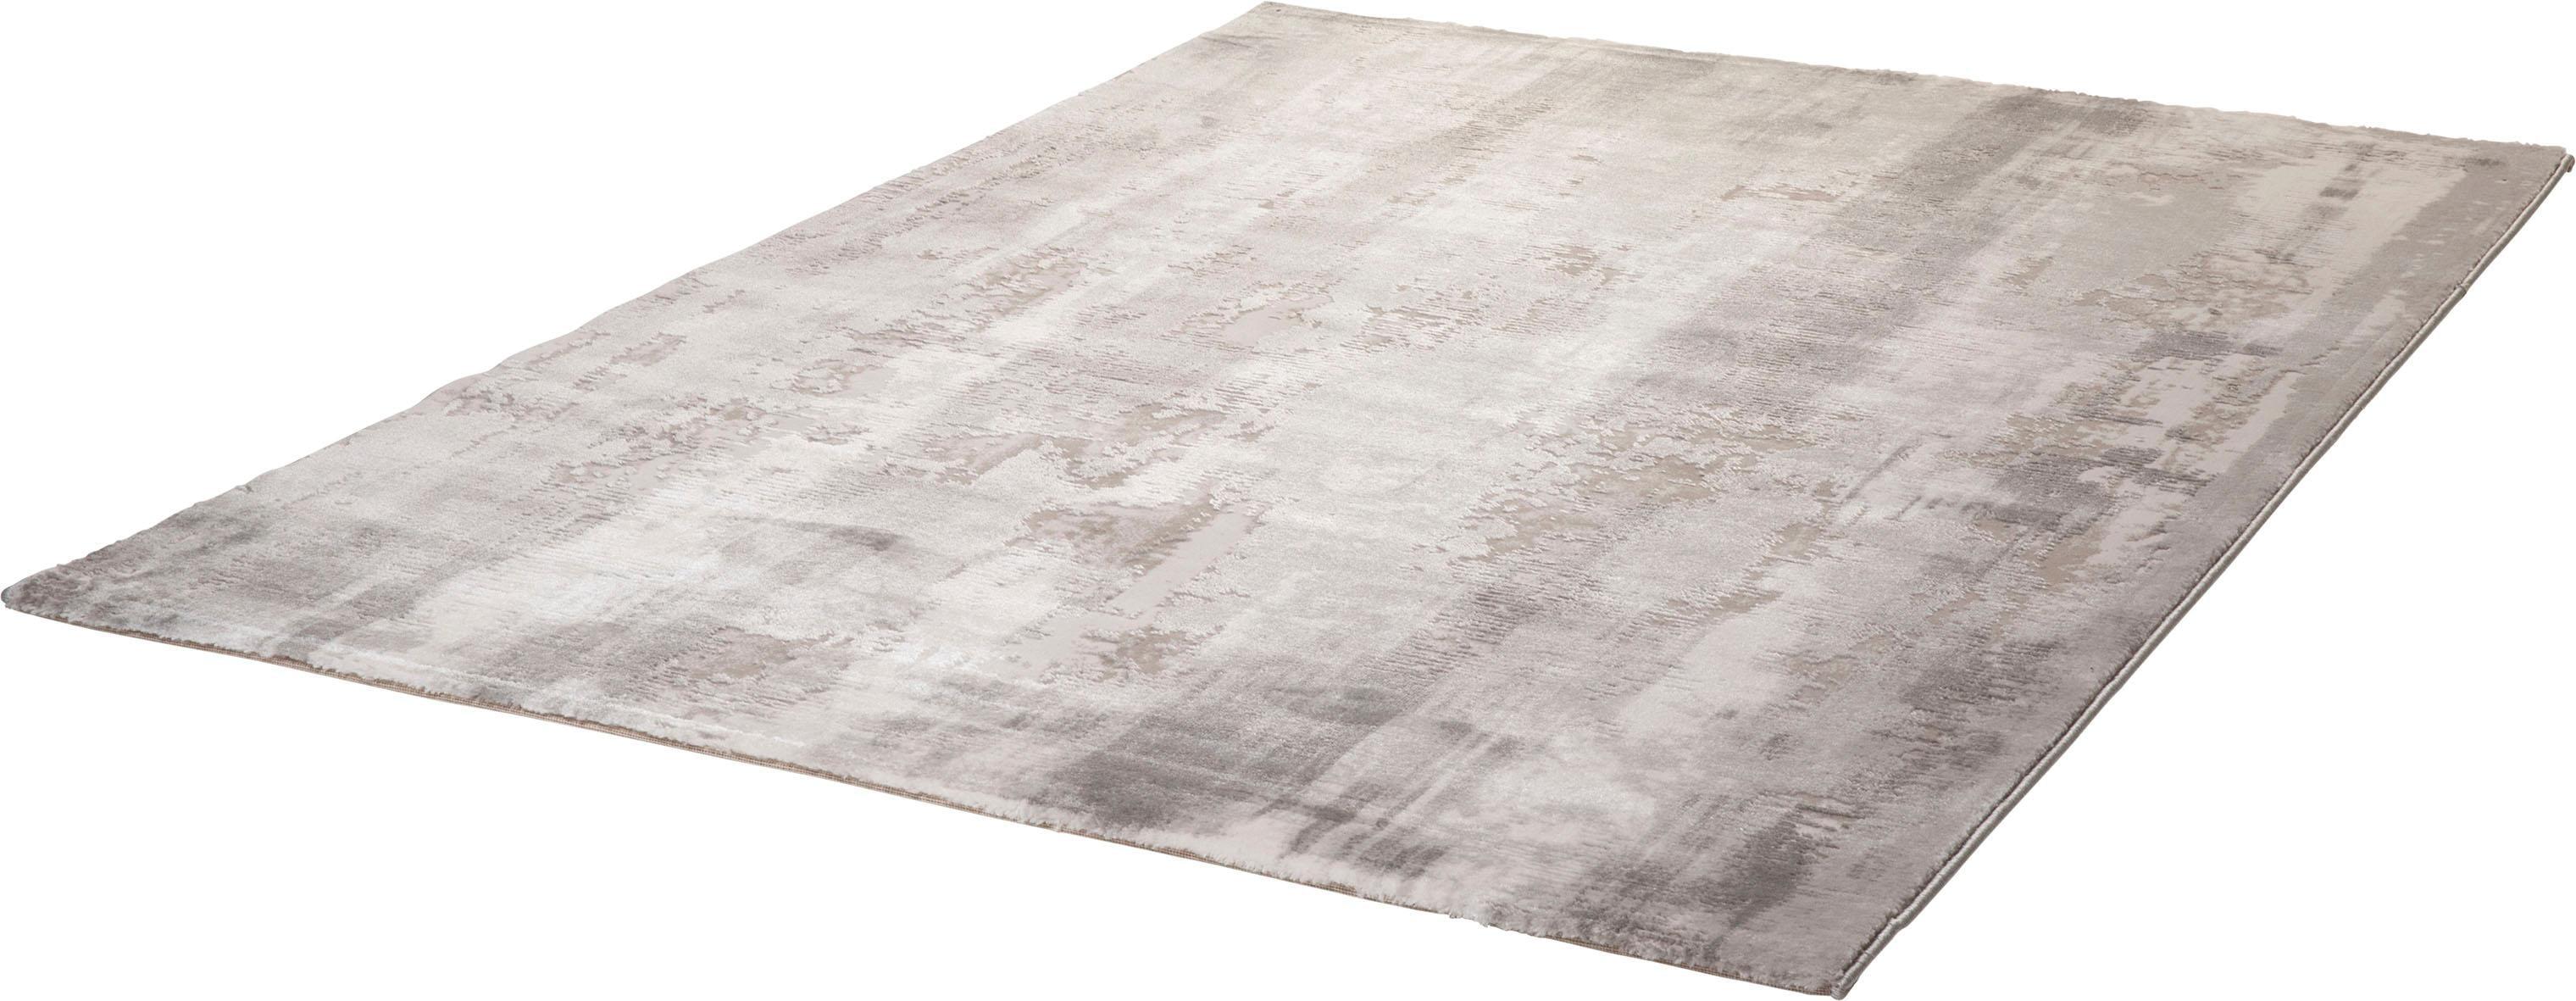 Teppich My Bolero 810 Obsession rechteckig Höhe 16 mm maschinell gewebt